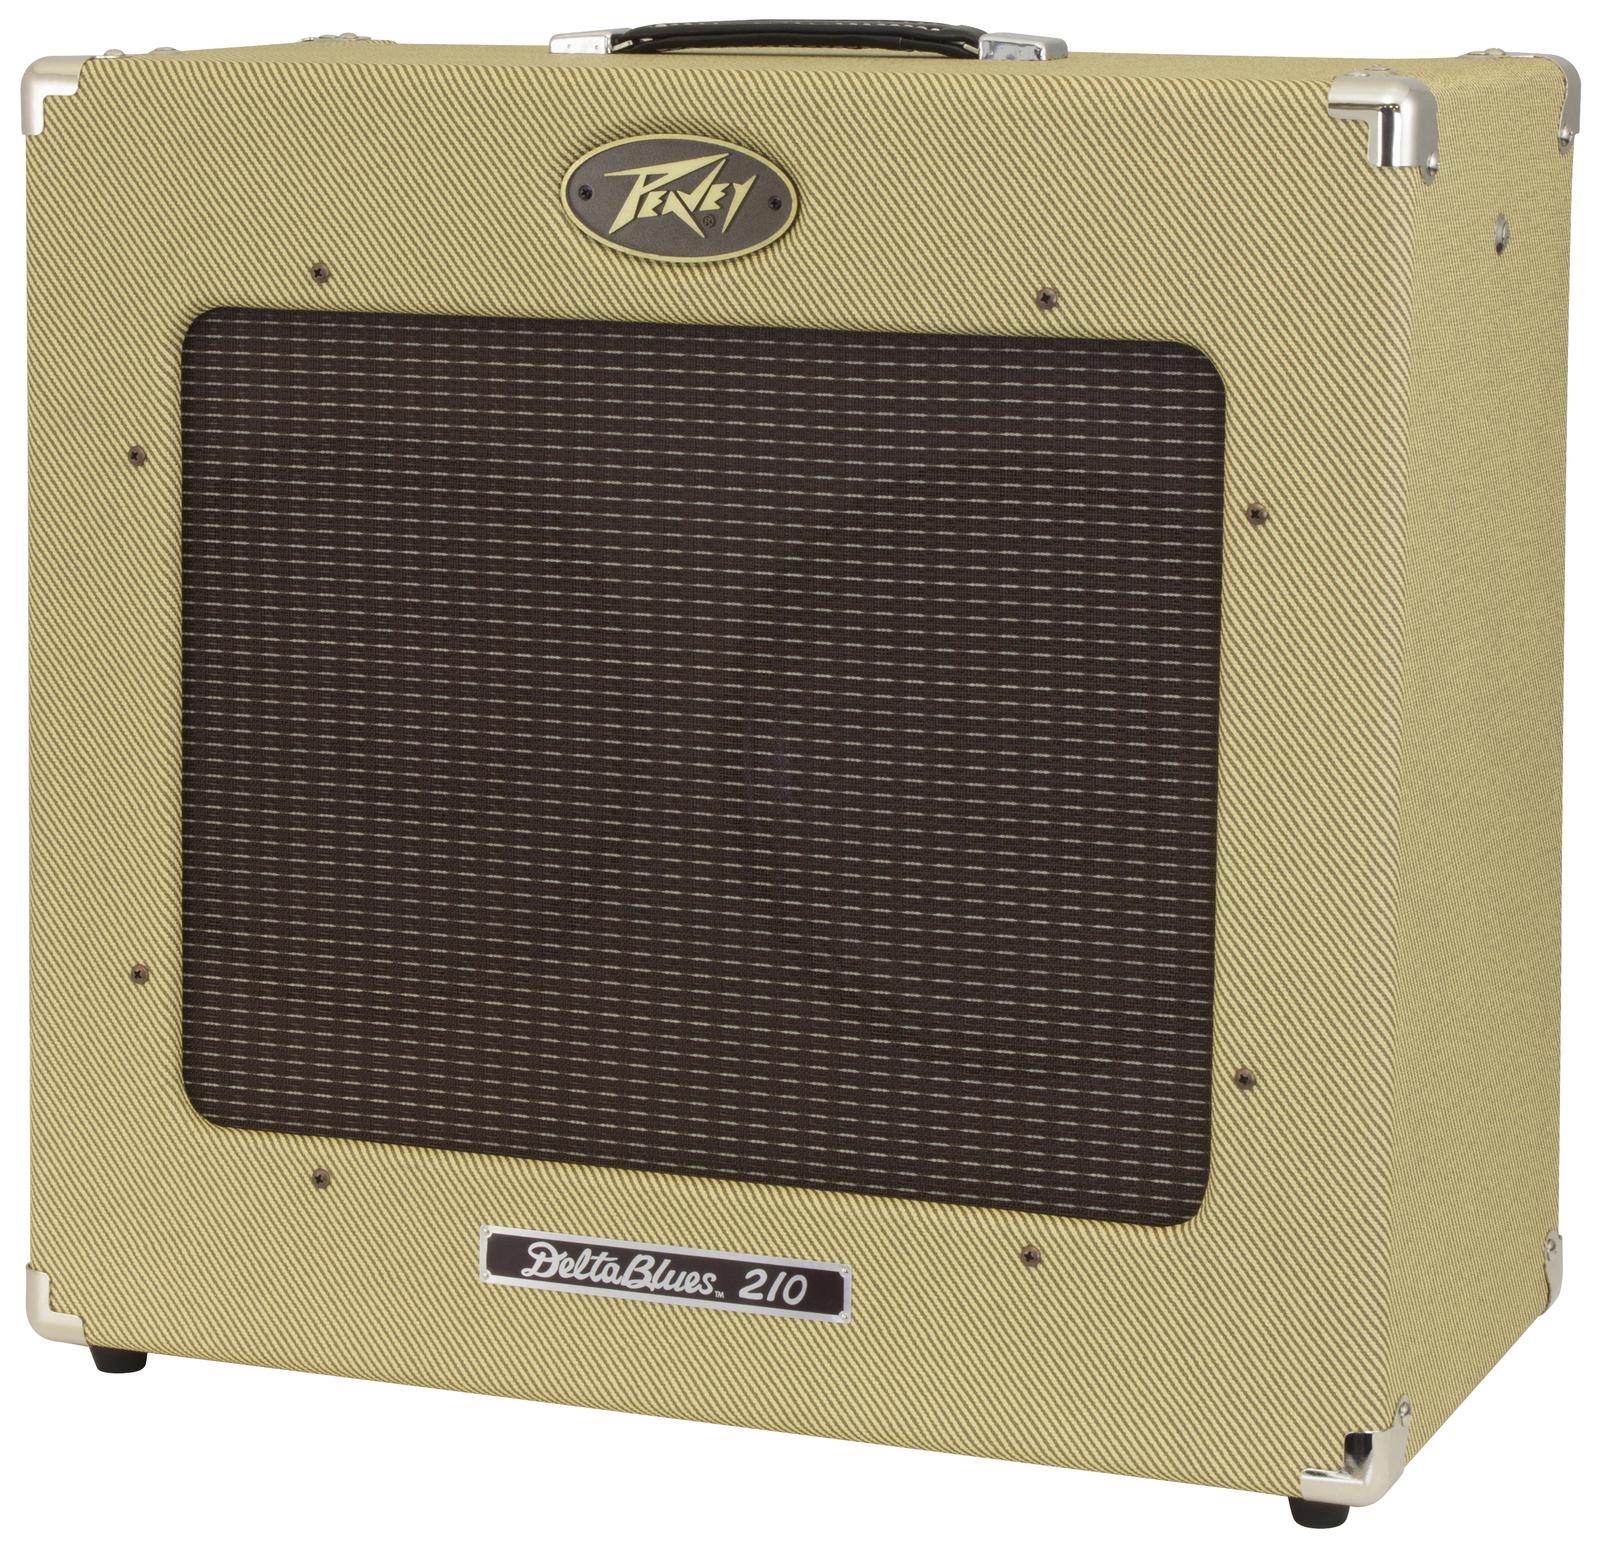 "PVDELTABLUES210 2 - Peavey Classic Series ""Delta Blues 210"" Guitar Amp Combo 30-Watt 2x10"""